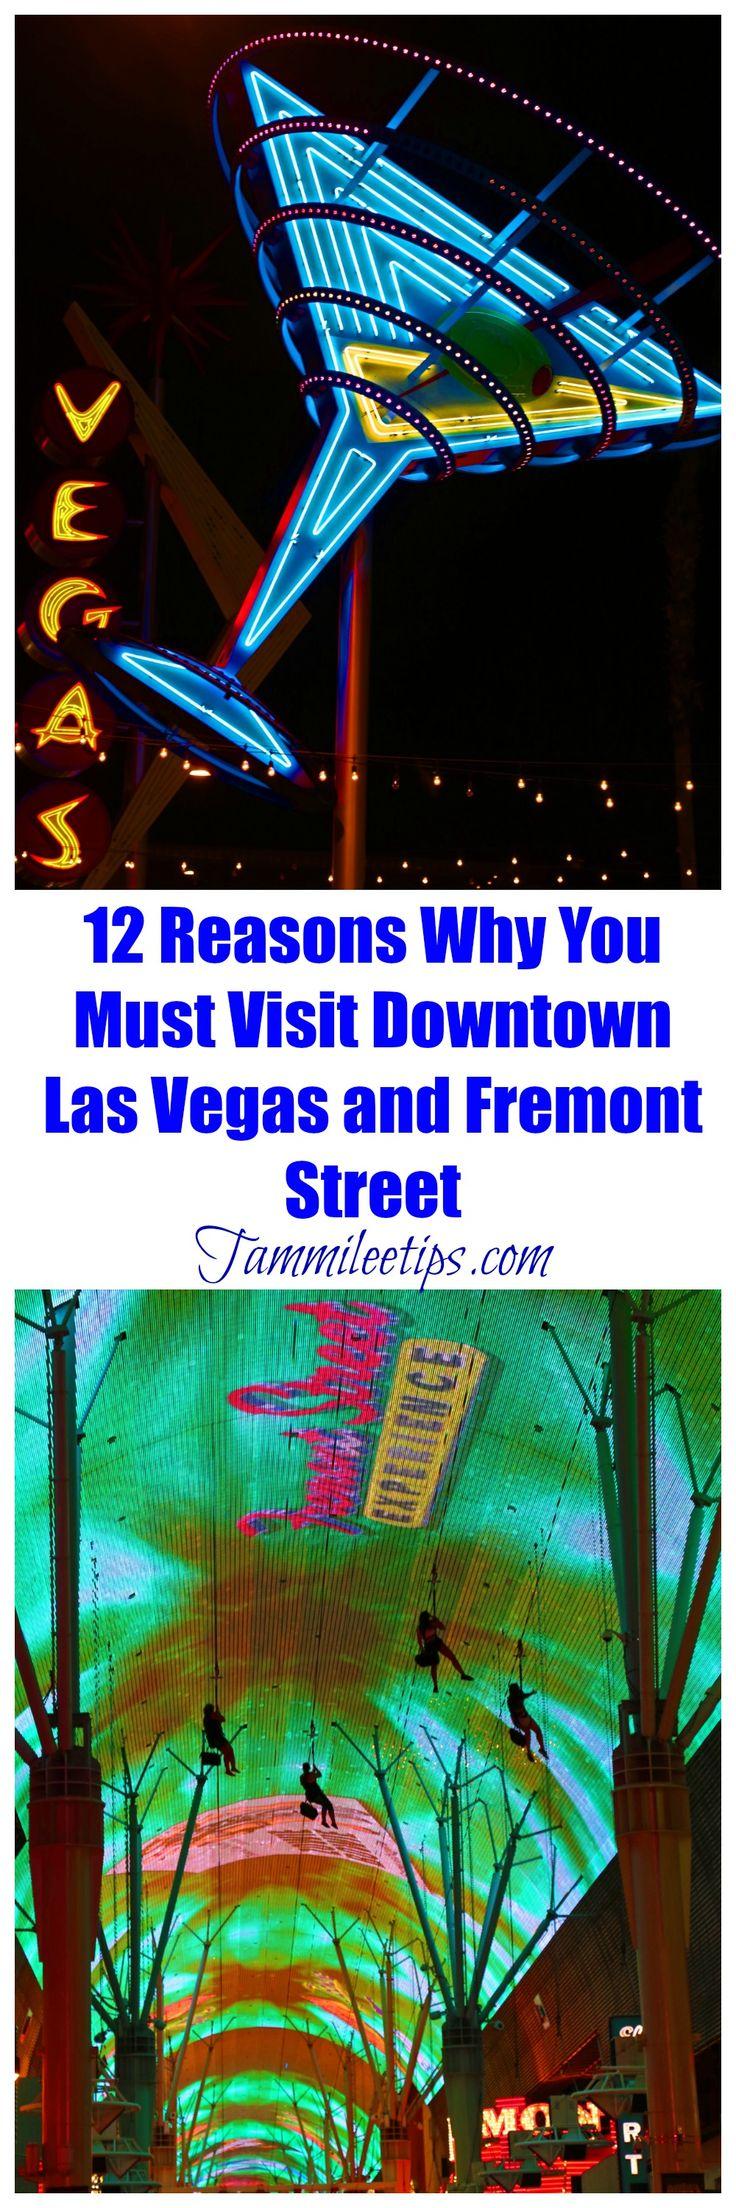 12 reasons why you must visit Downtown Las Vegas & Fremont Street via @tammileetips